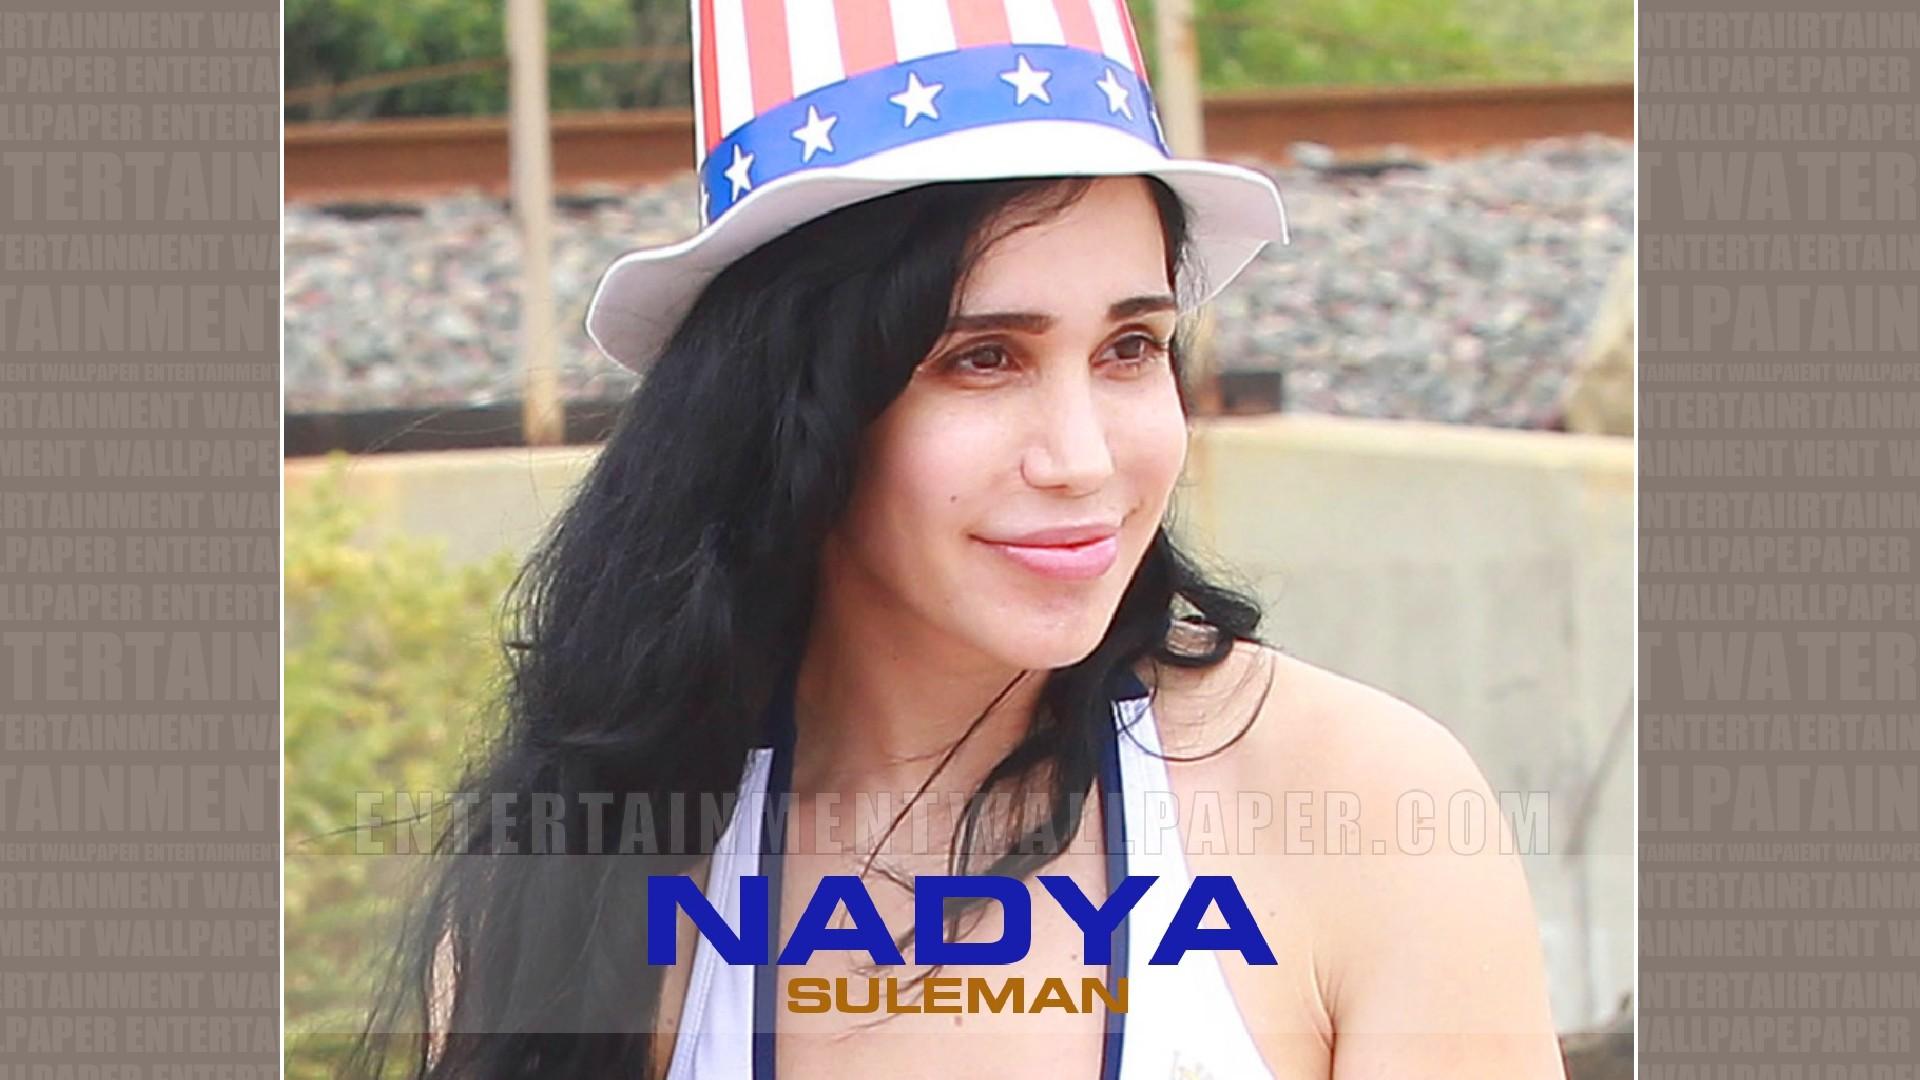 Nadya Suleman Wallpaper - Original size, download now.